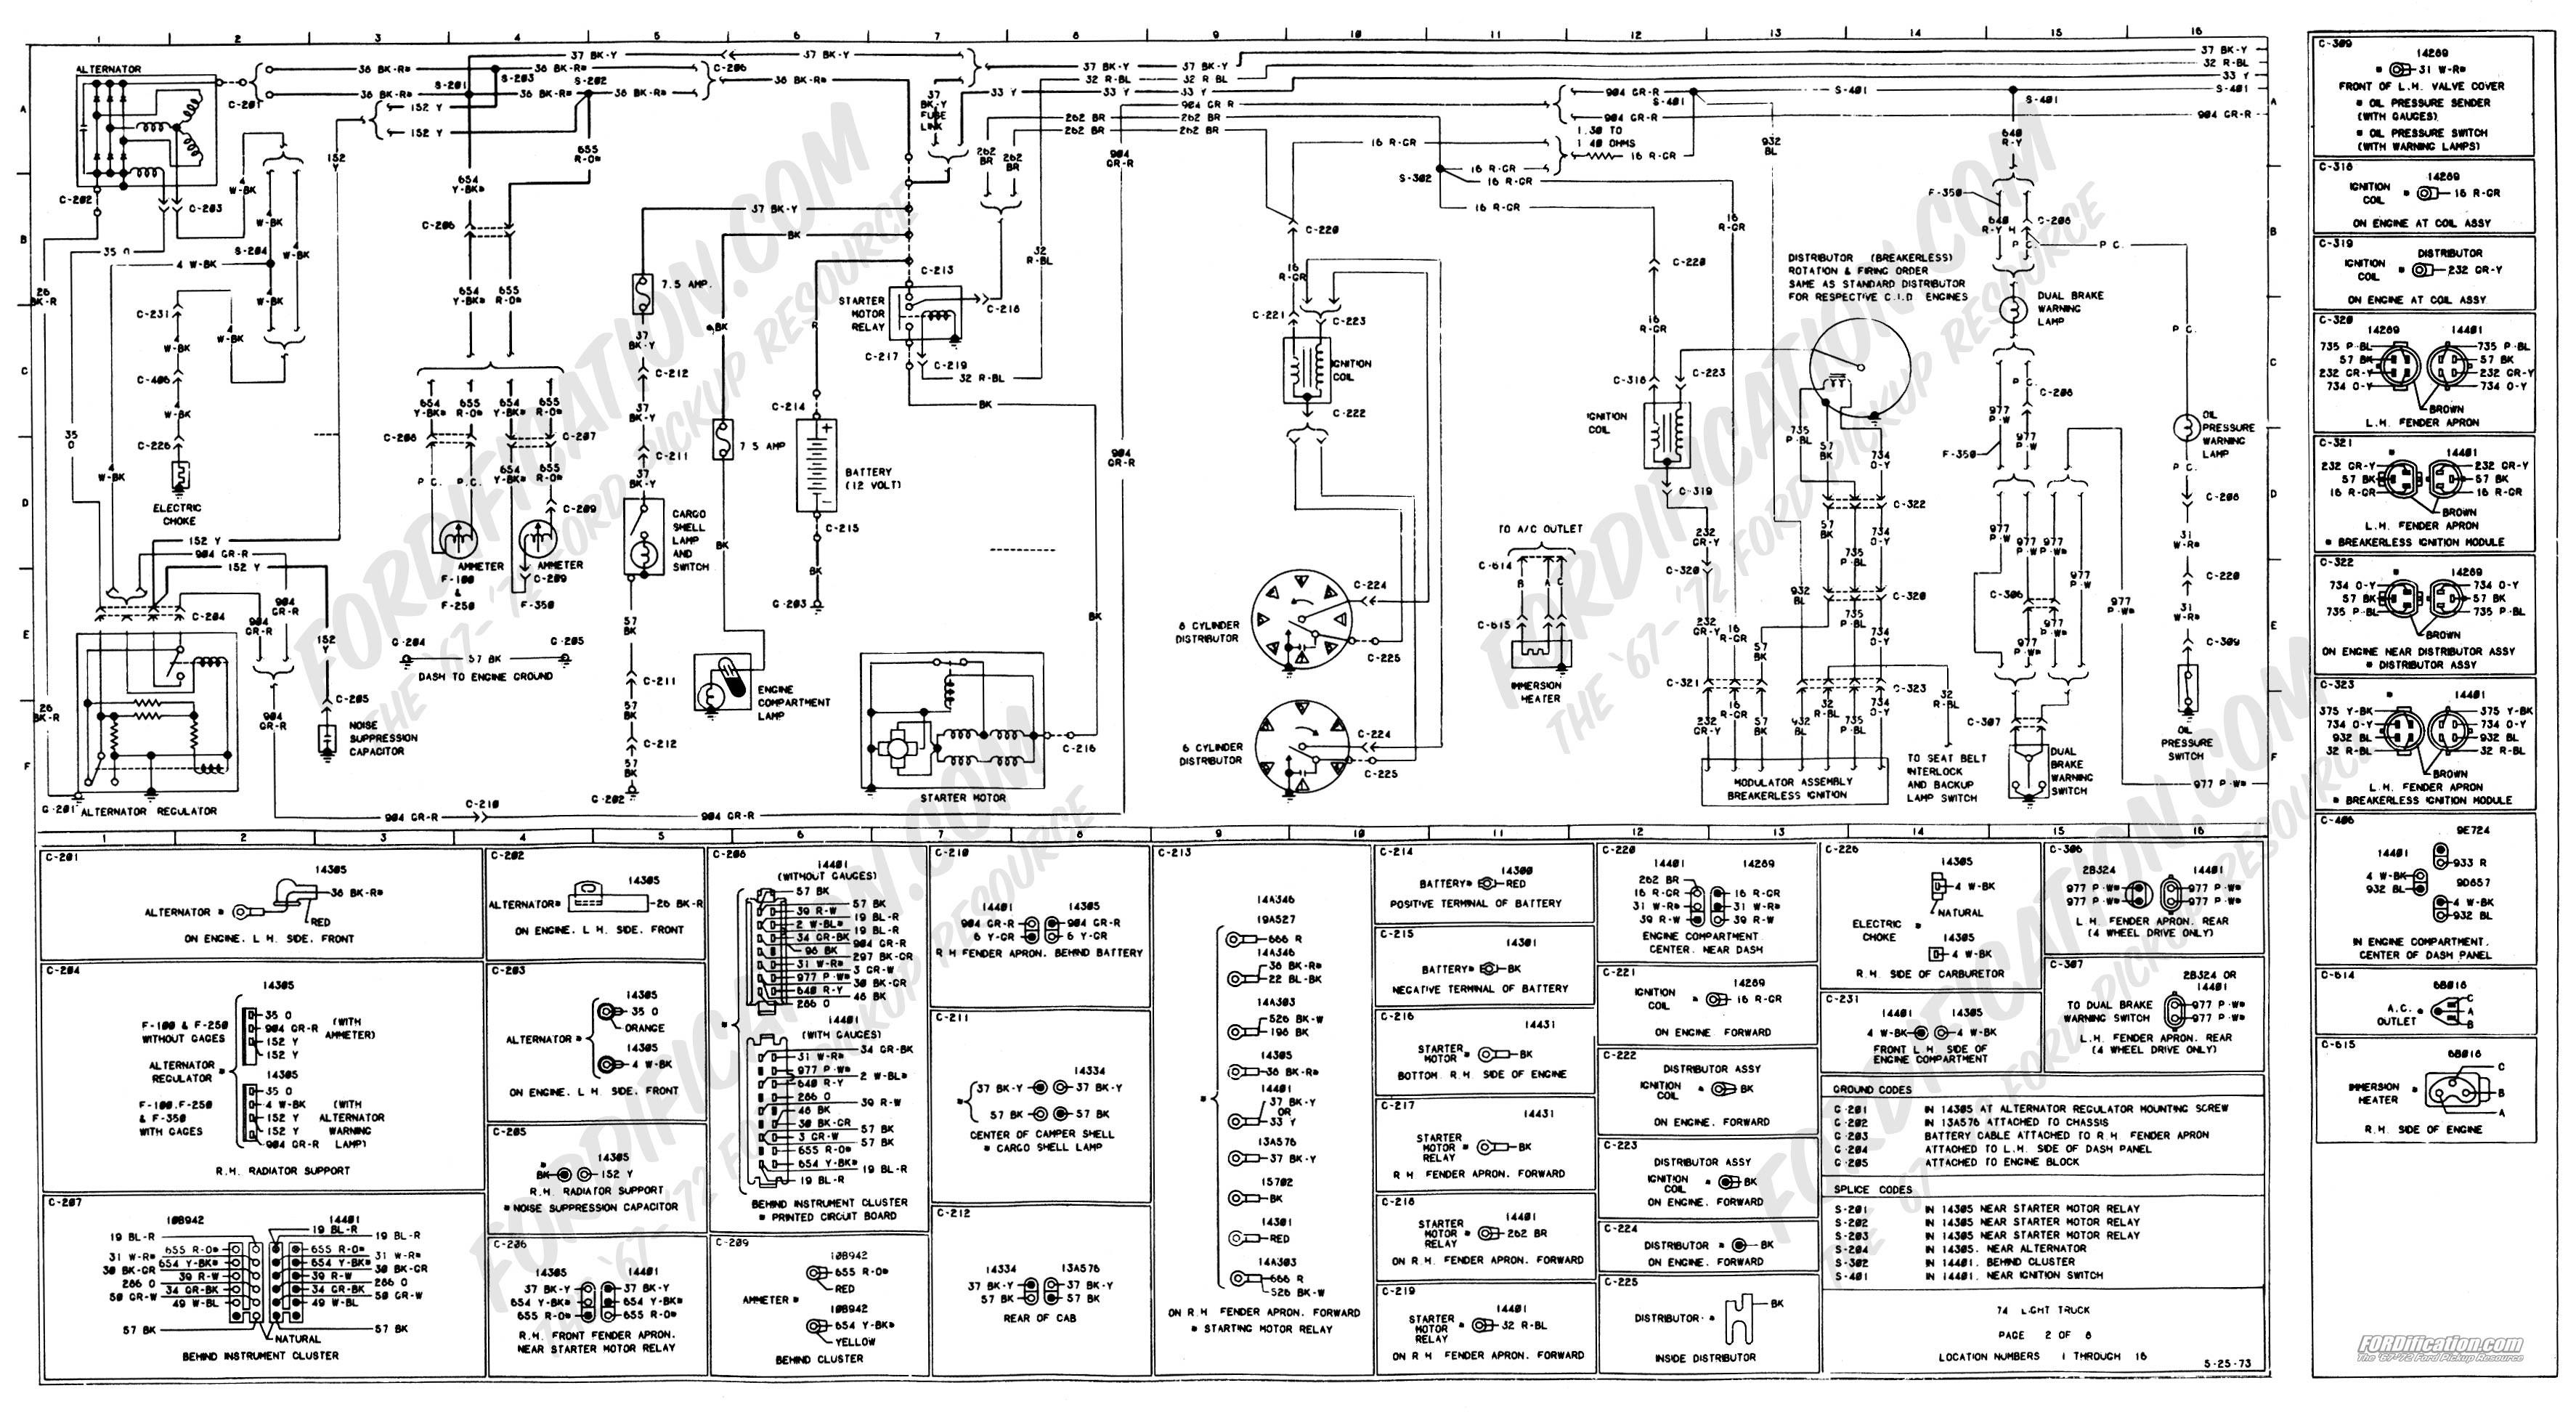 2009 sterling wiring diagram wiring diagramsterling wiring diagrams 7 cotsamzp timmarshall info \\u20222000 sterling fuse box wiring data diagram rh